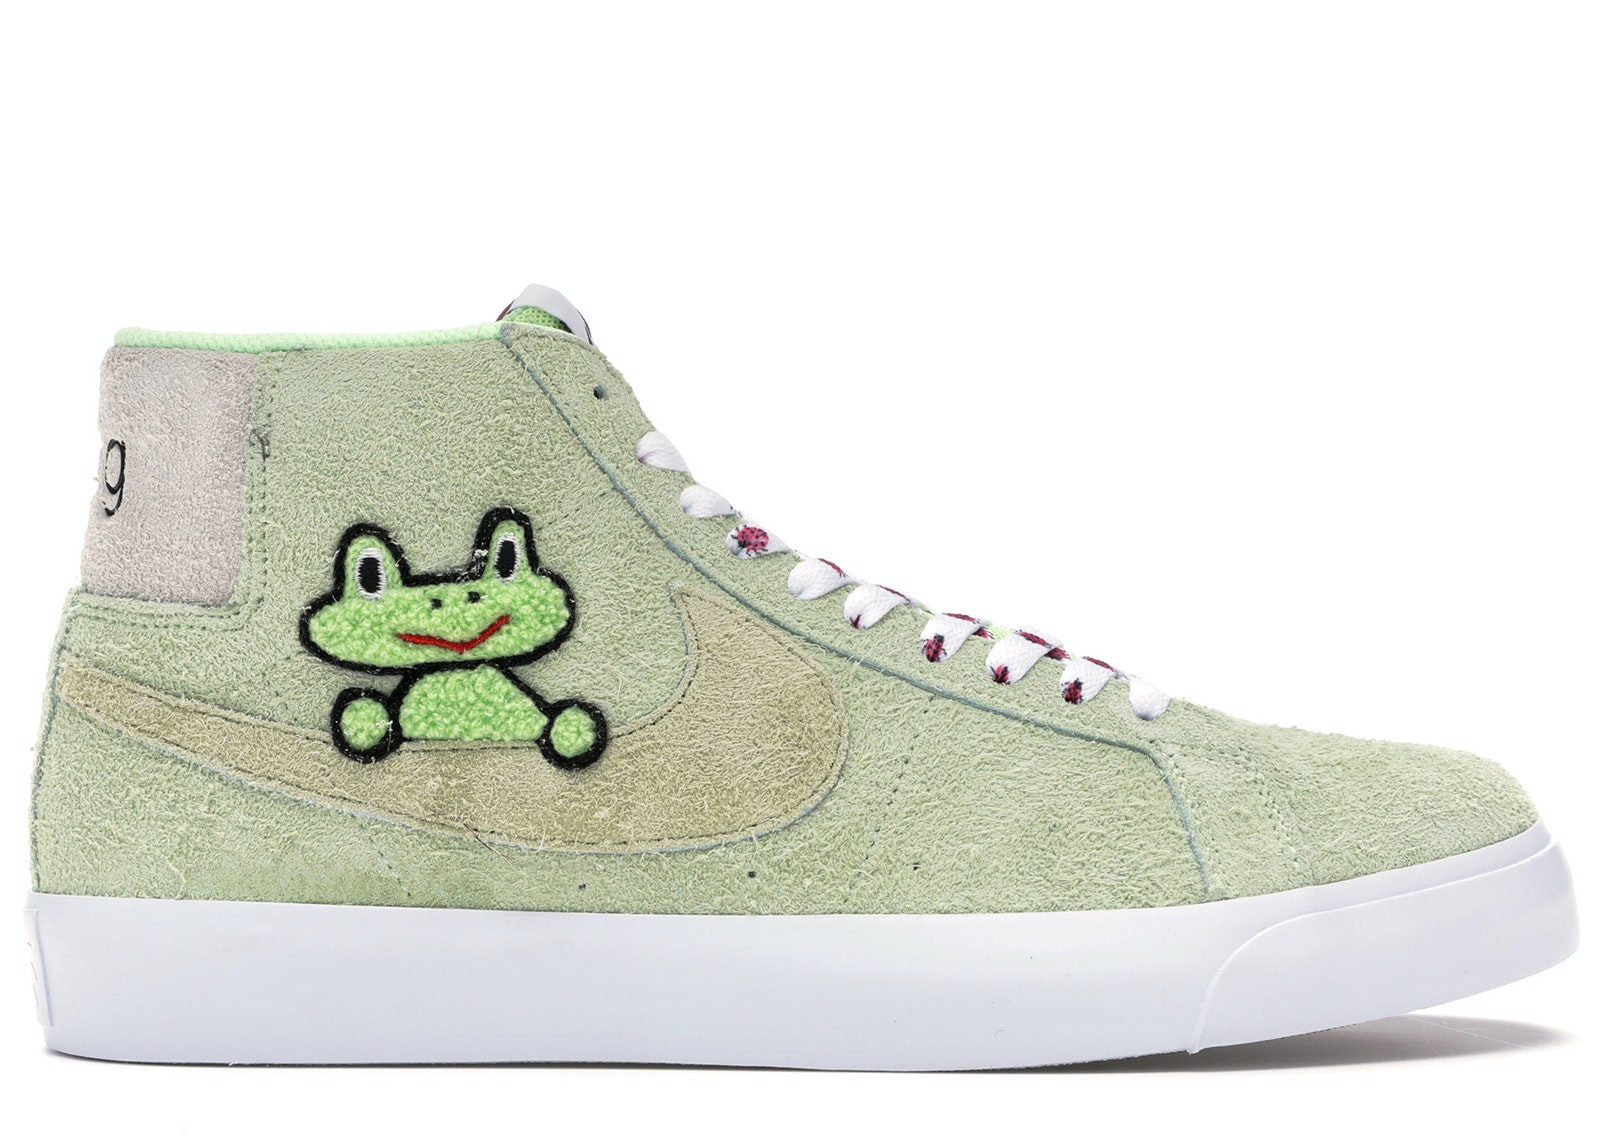 Nike SB Blazer Frog Skateboards